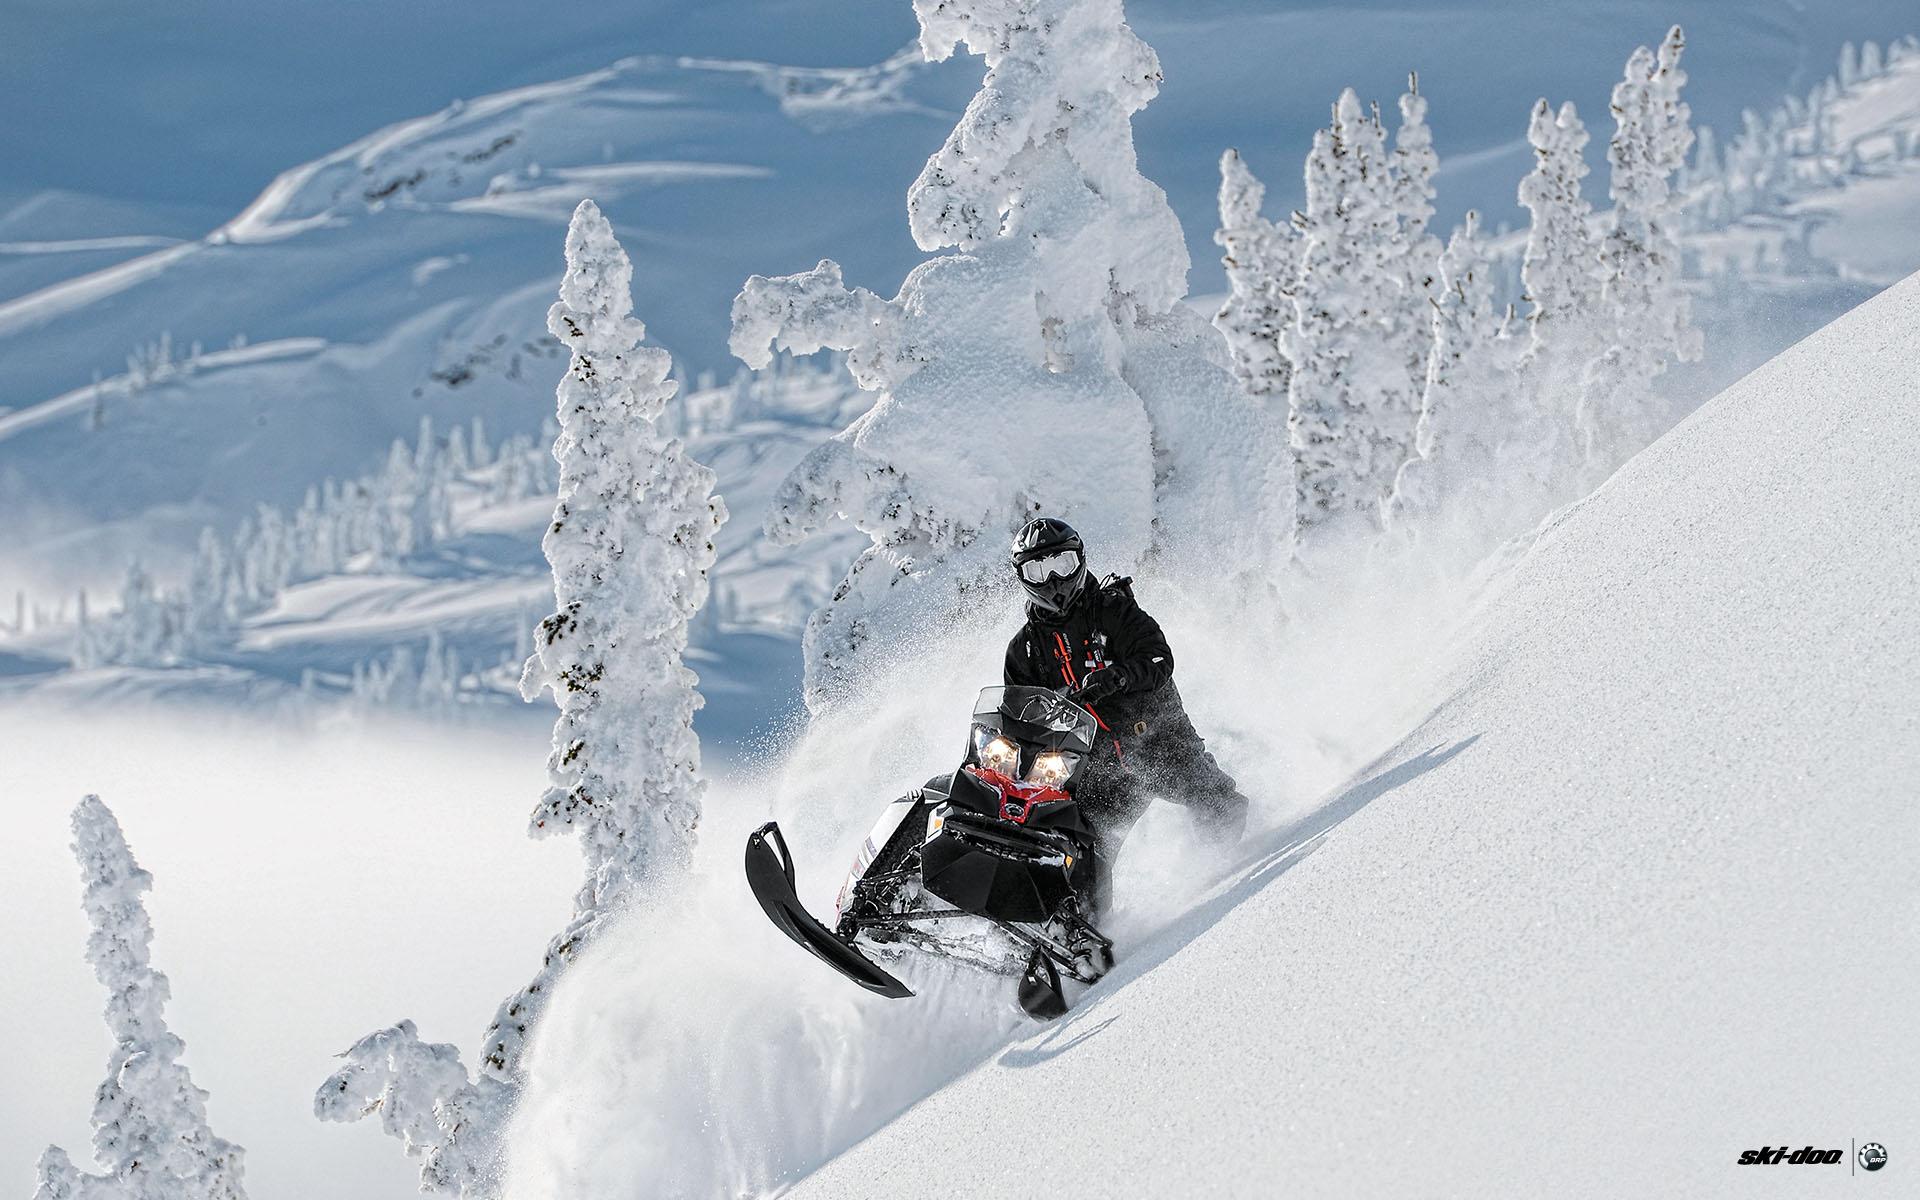 Ski Doo Wallpaper 2014 ski doo summit e tec 800r 1920x1200